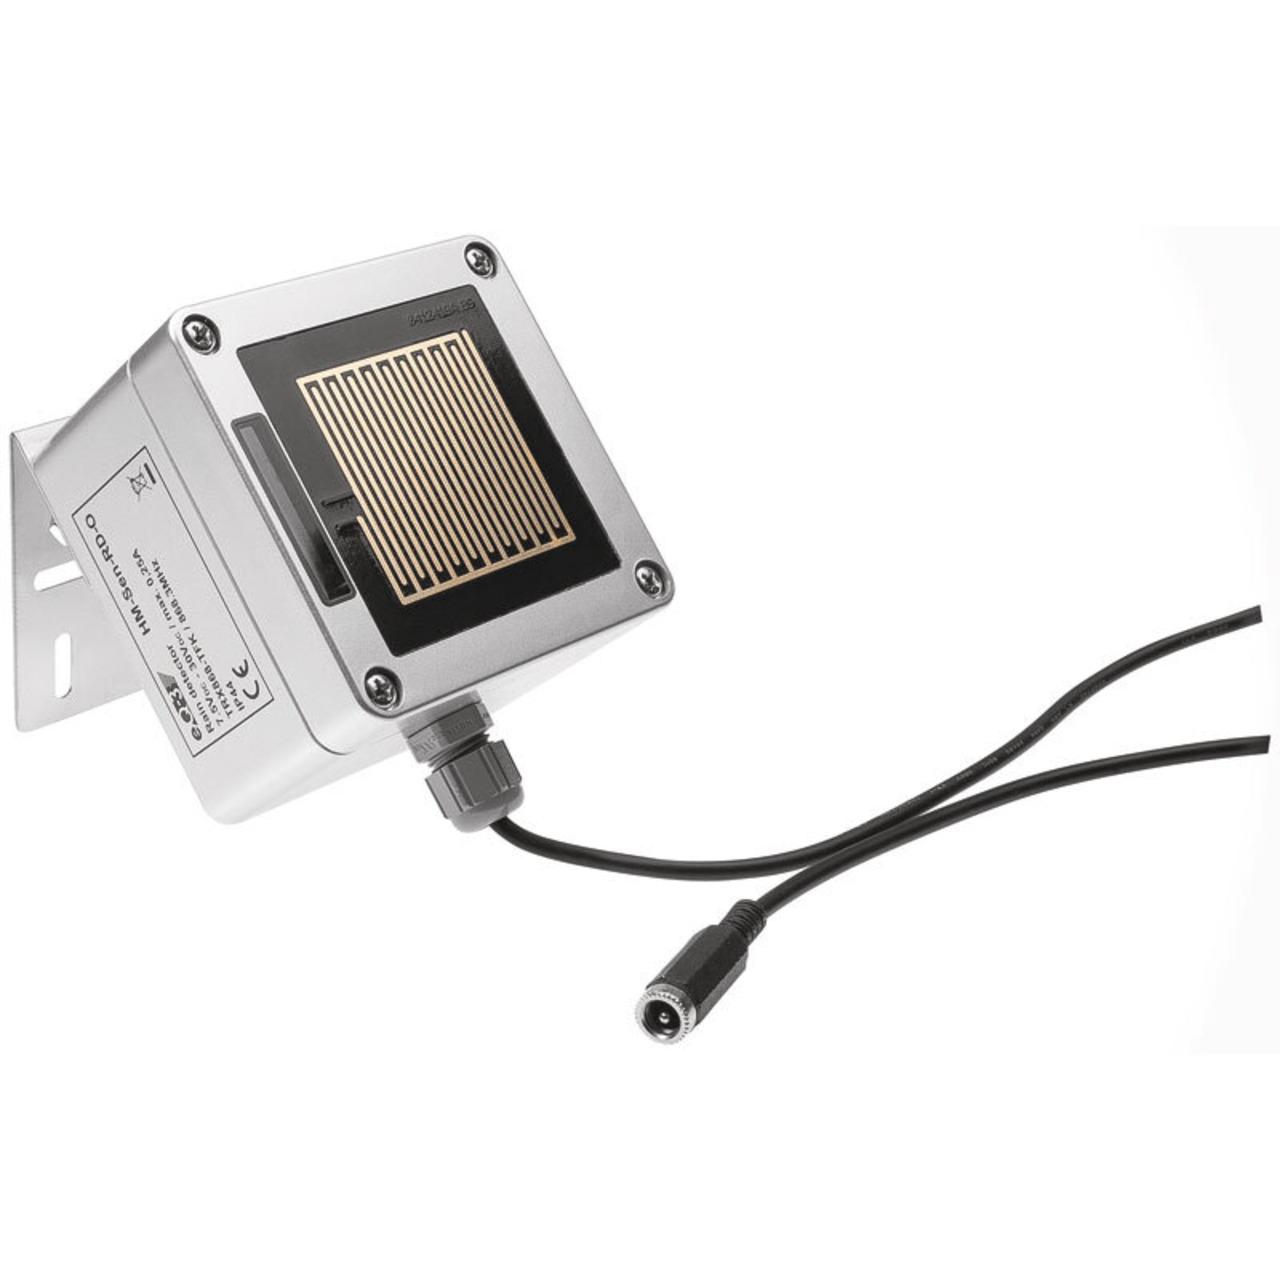 Homematic Funk-Regensensor HM-Sen-RD-O für Smart Home / Hausautomation